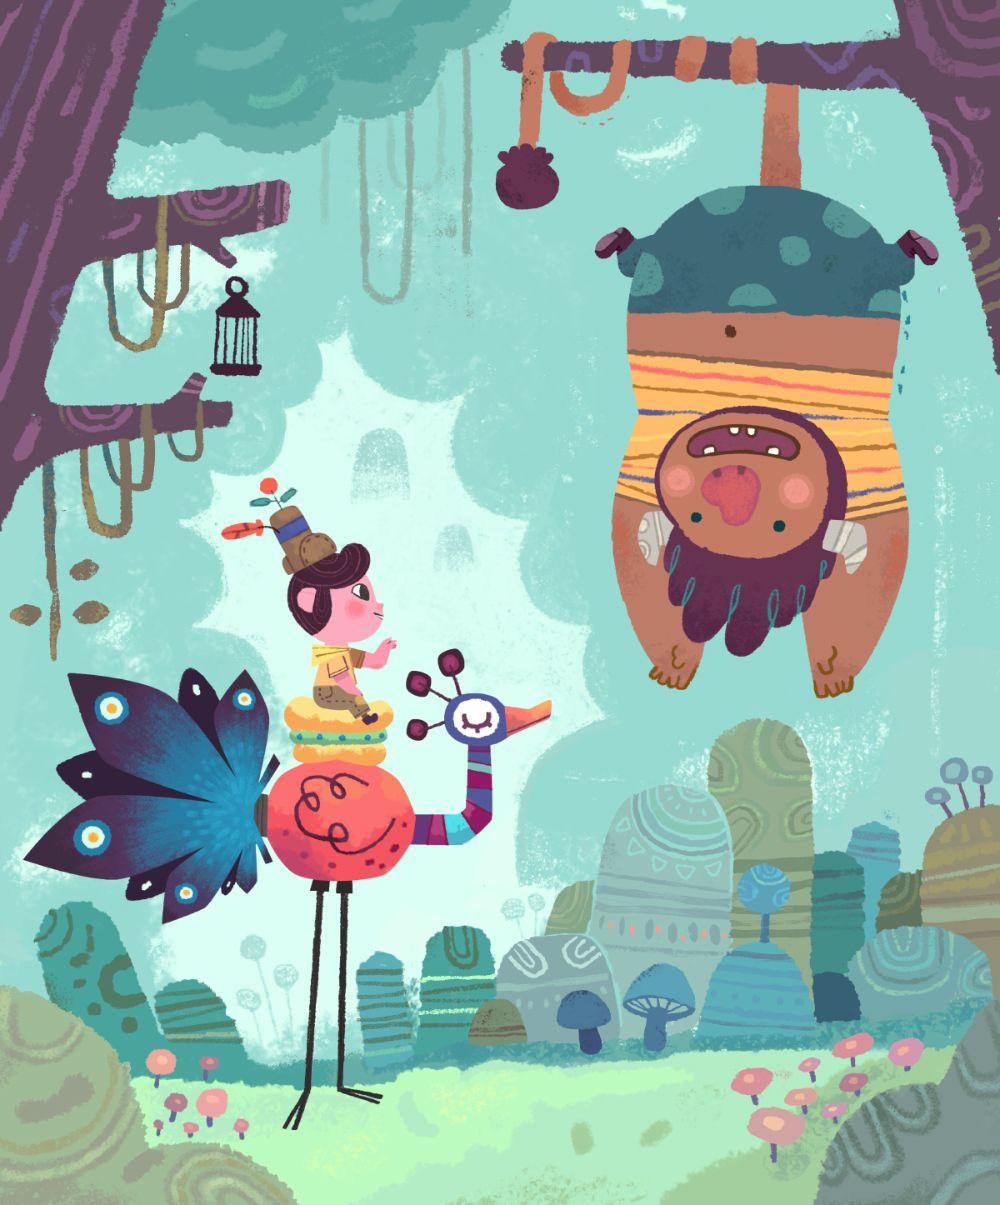 Playtime Mr Bubbly On Behance Illustration Art Kids Doodle Illustration Picture Books Illustration